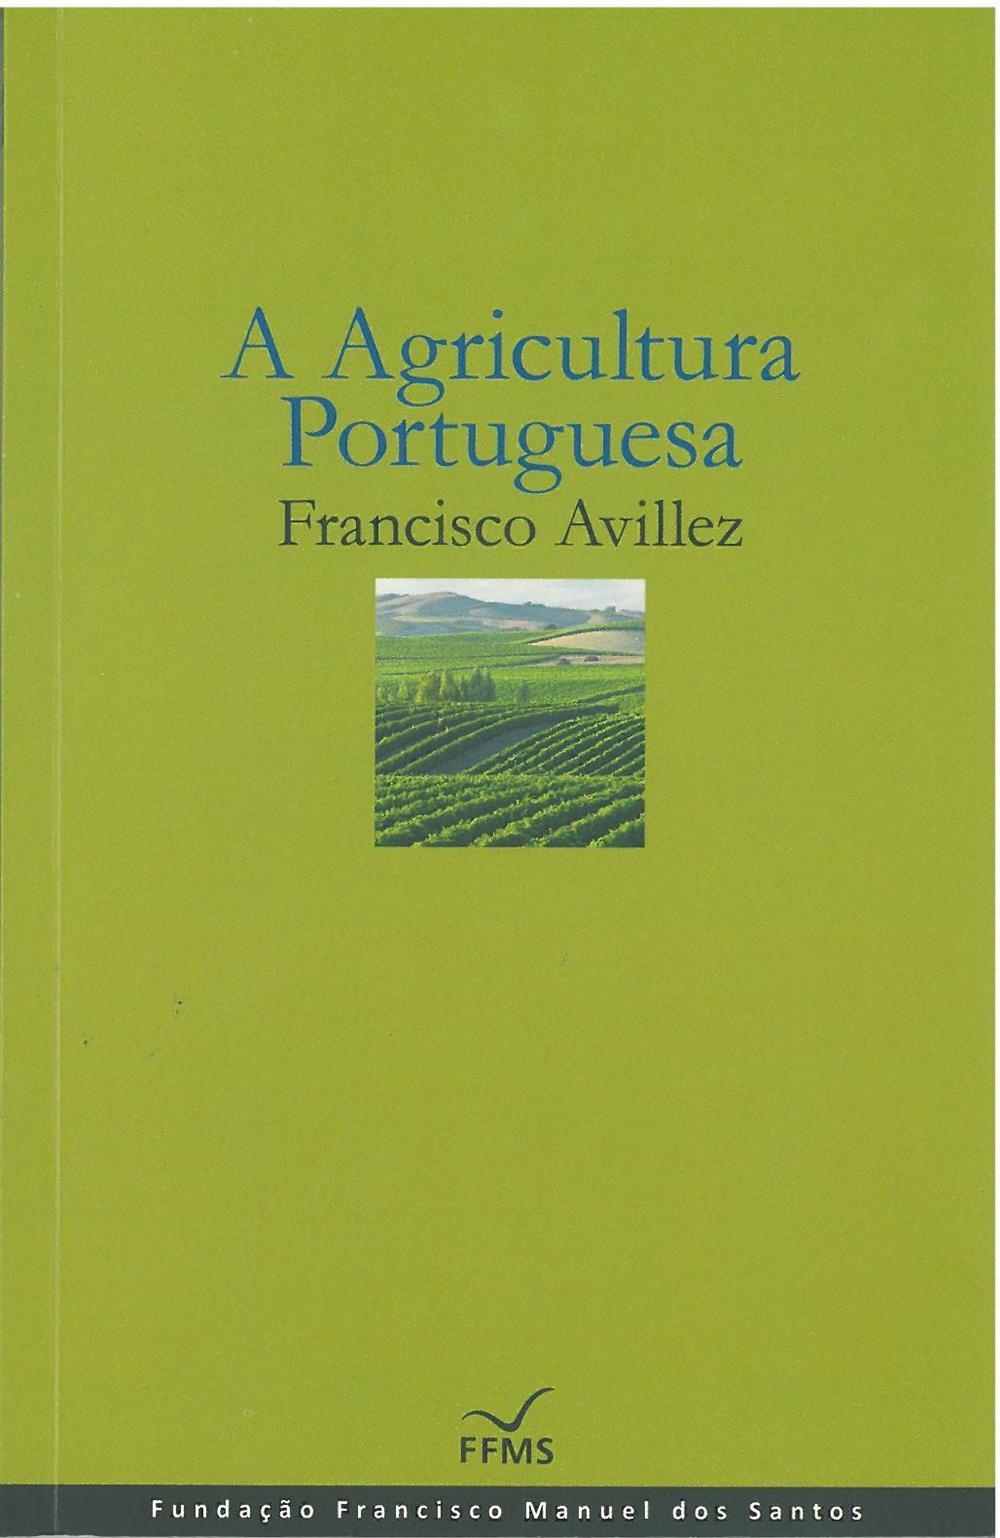 A agricultura portuguesa_.jpg